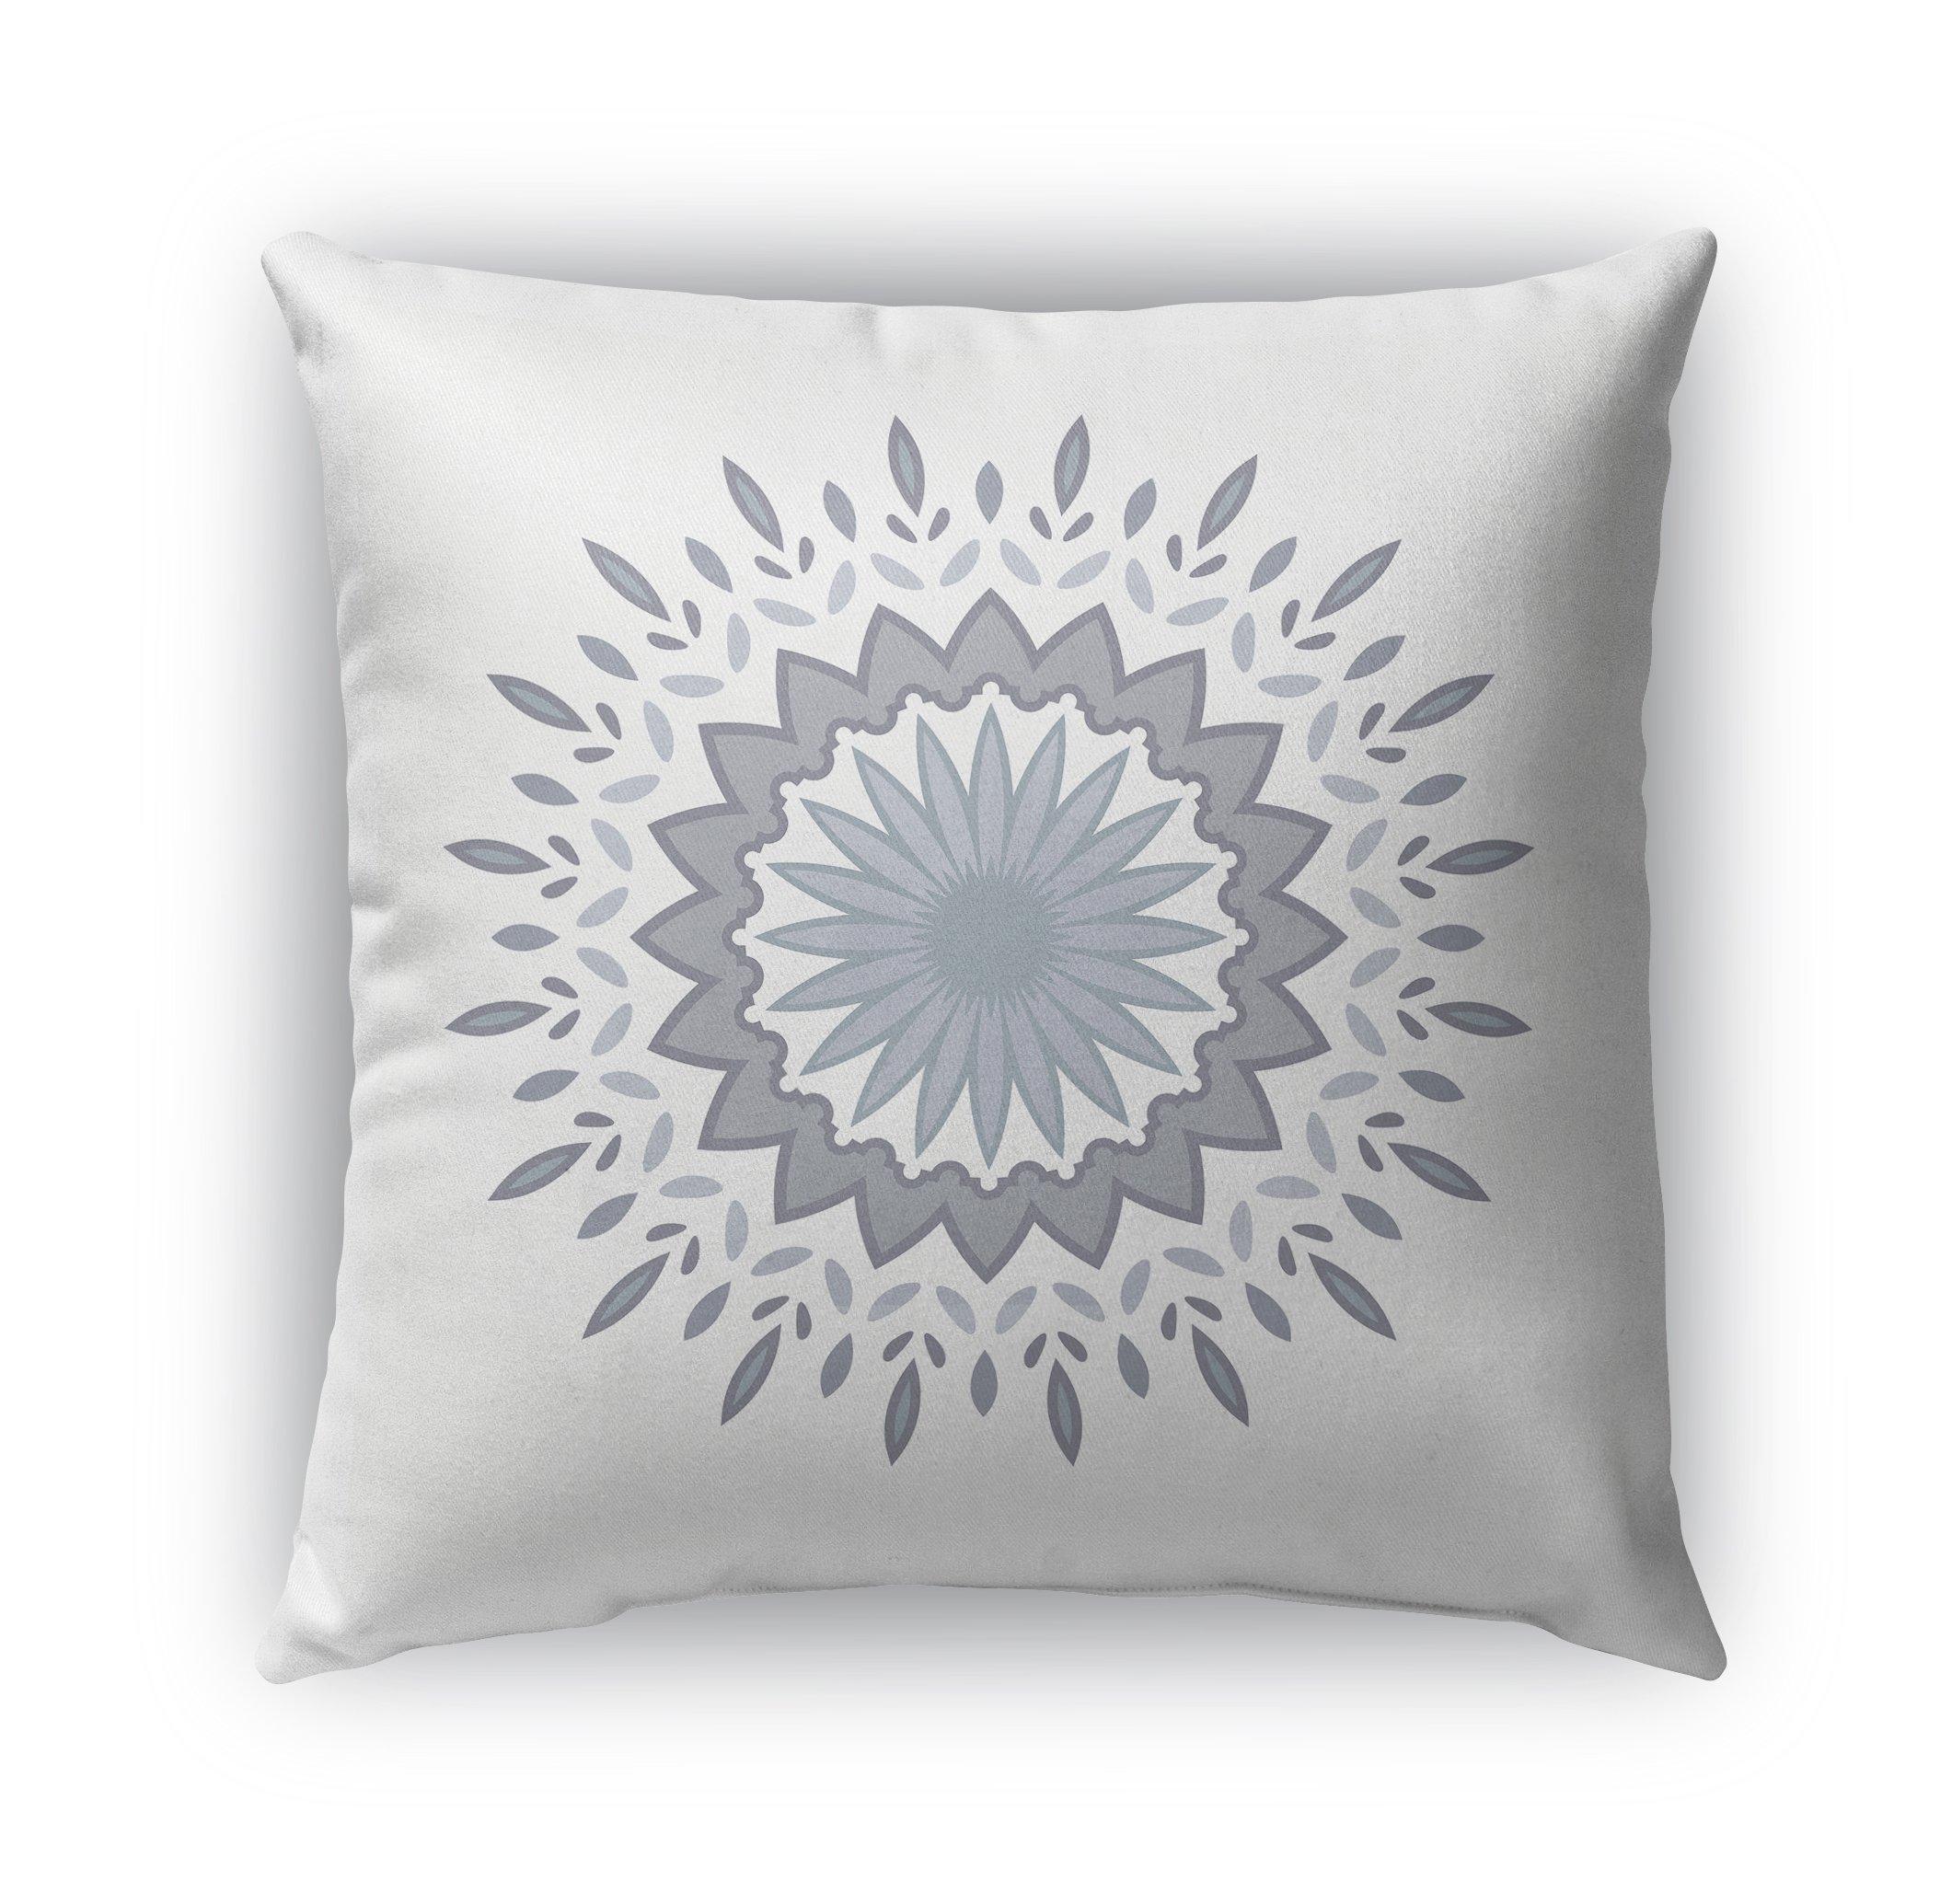 KAVKA DESIGNS Flower Power Indoor/Outdoor Throw Pillow, Grey, Blue - 18'' X 18''